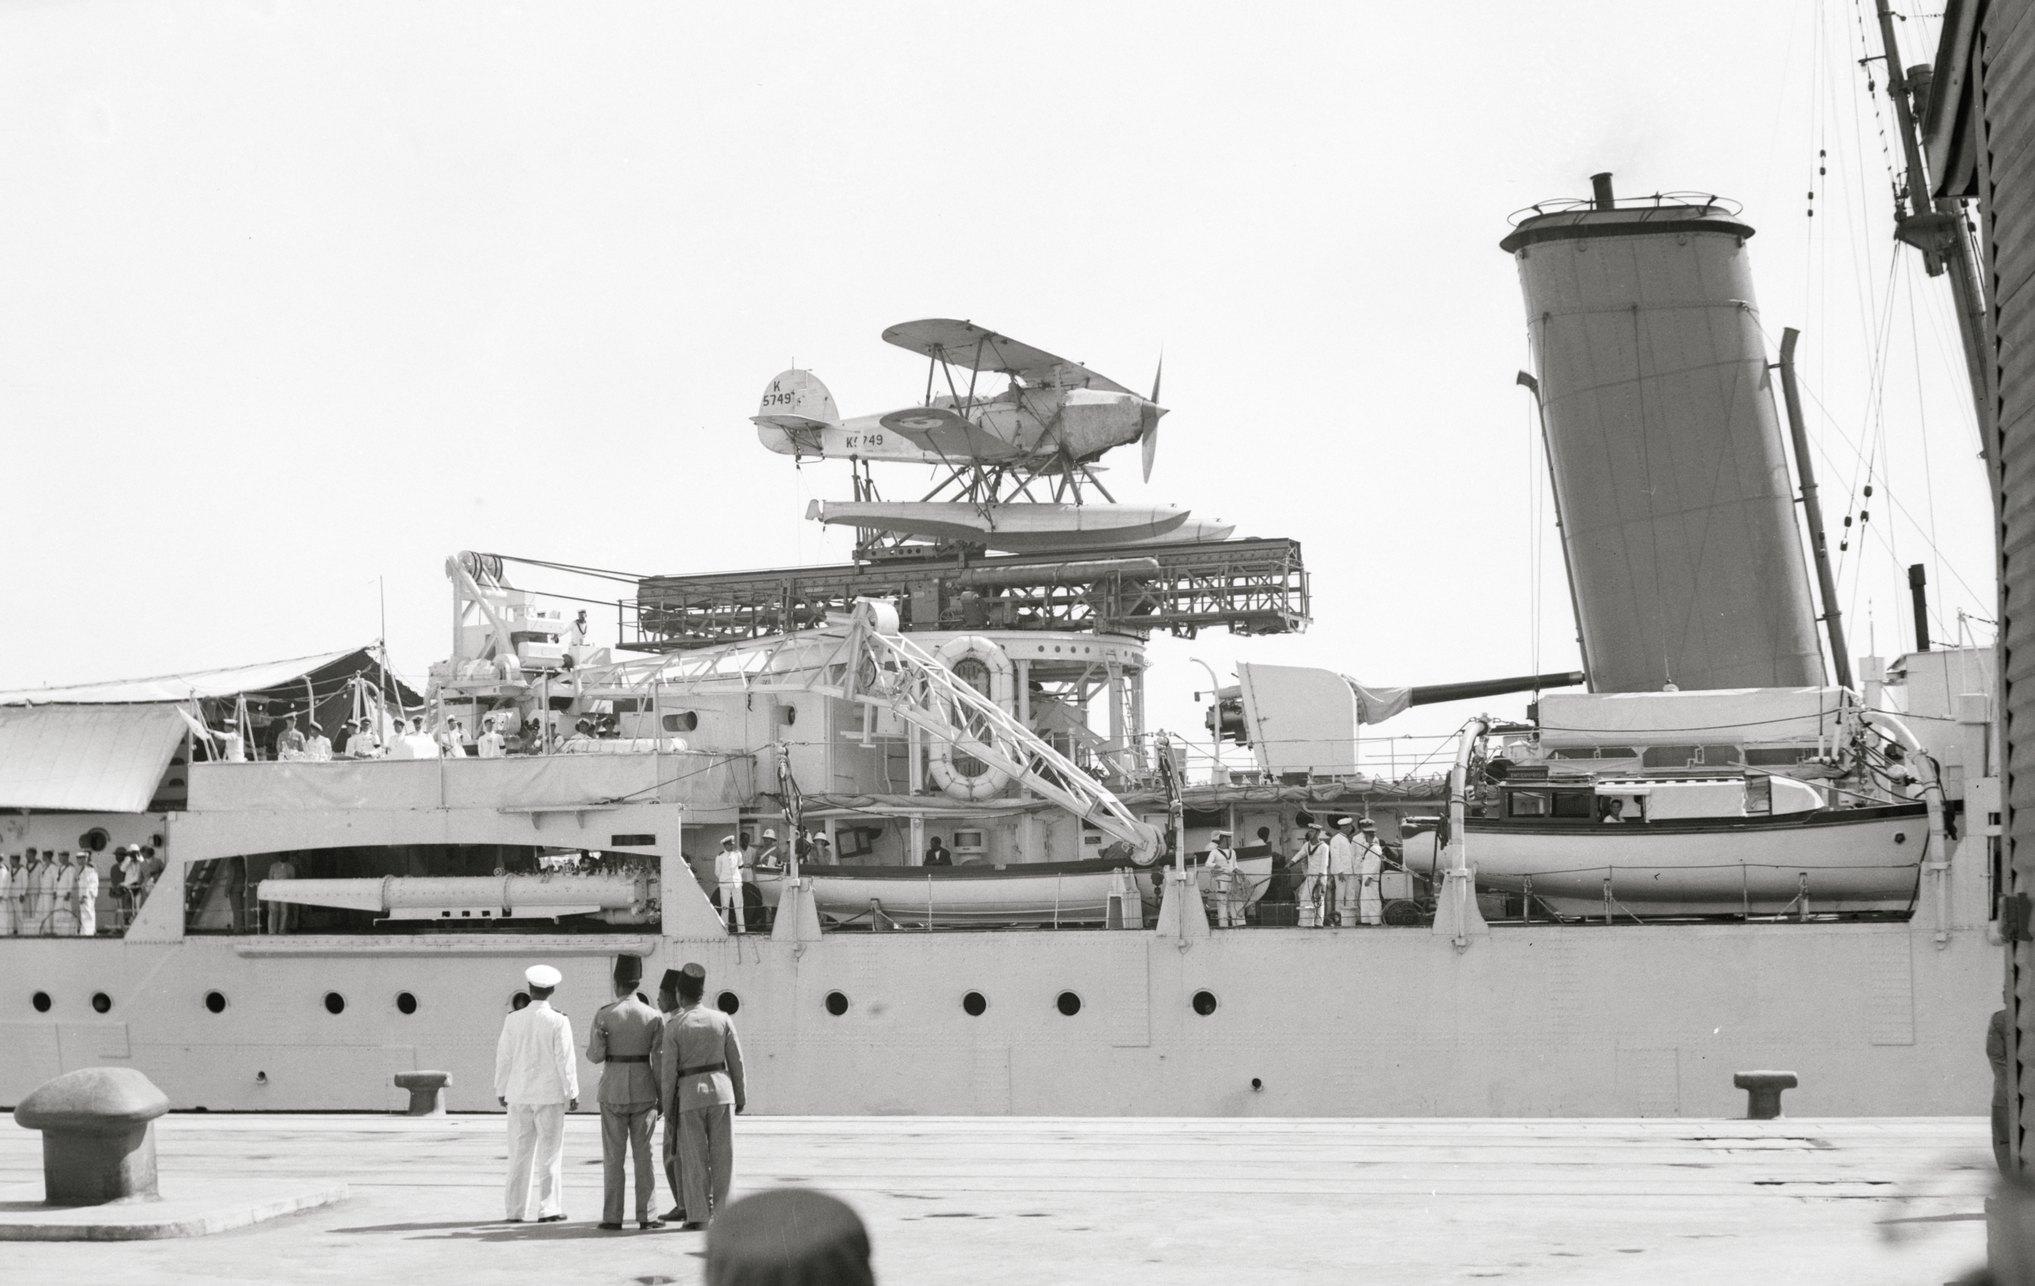 HMS_Enterprise_1936_LOC_matpc_20251.jpg